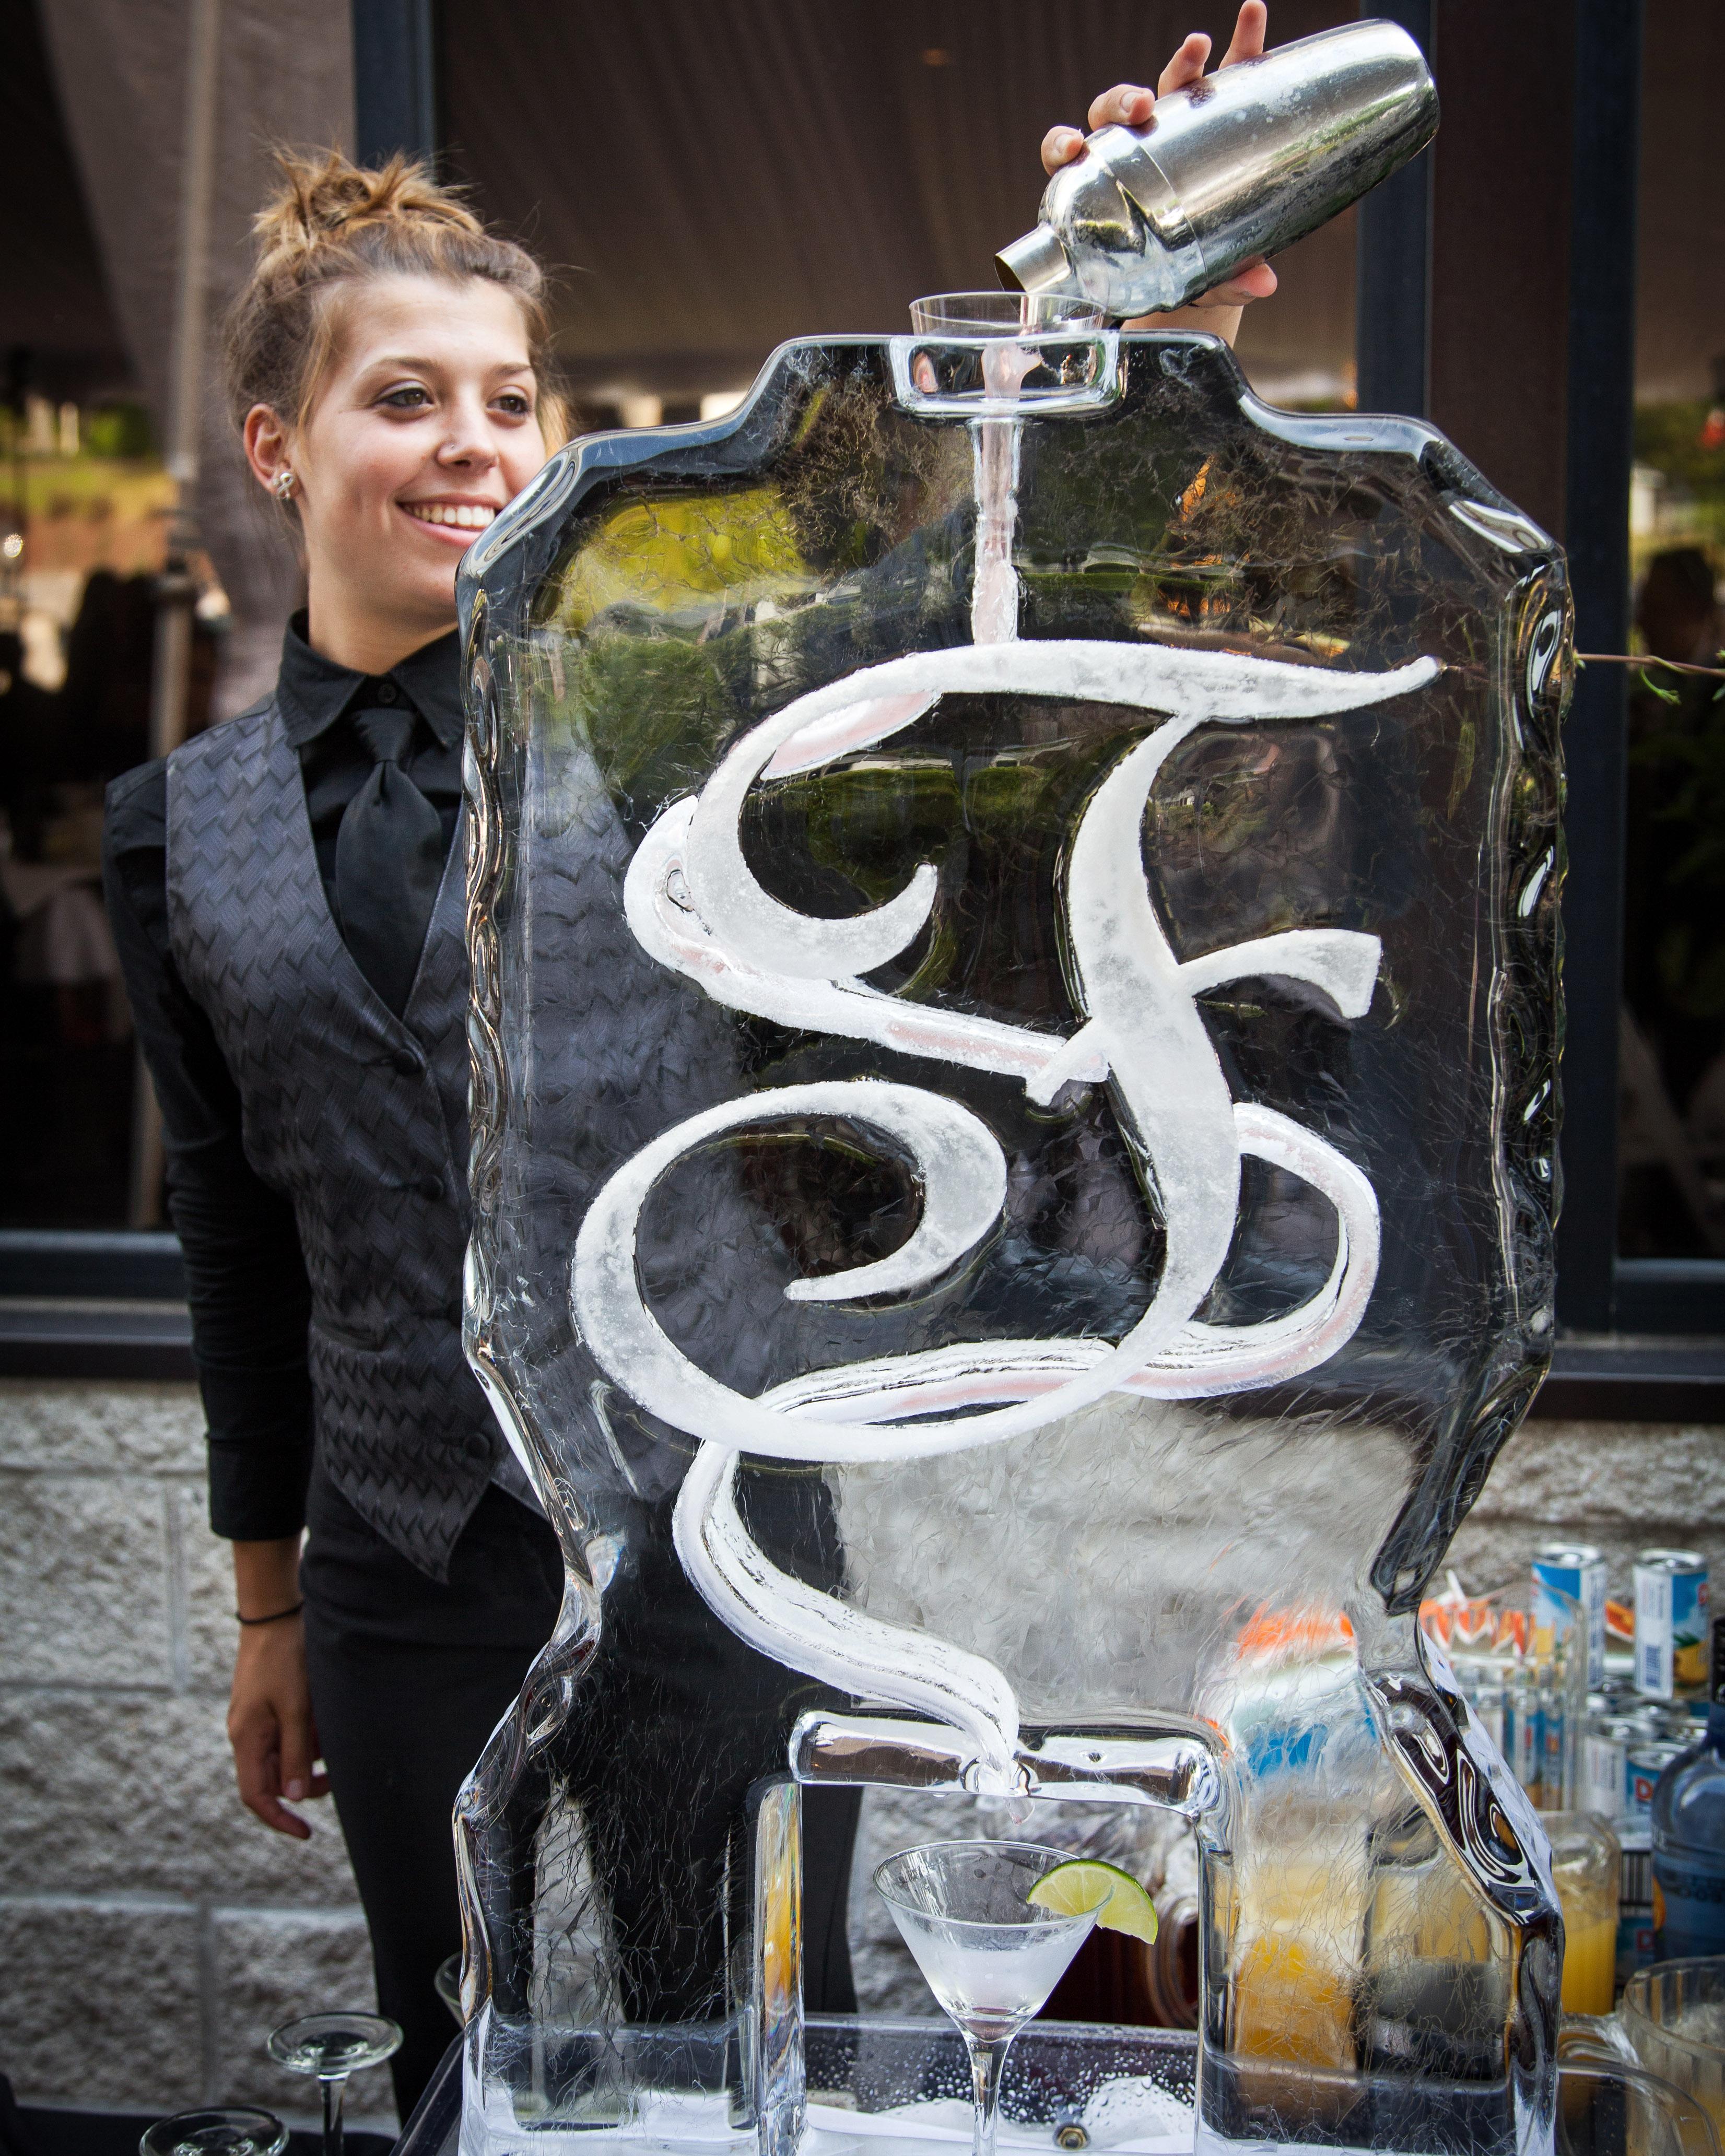 wedding ice sculpture monogrammed drink serving station